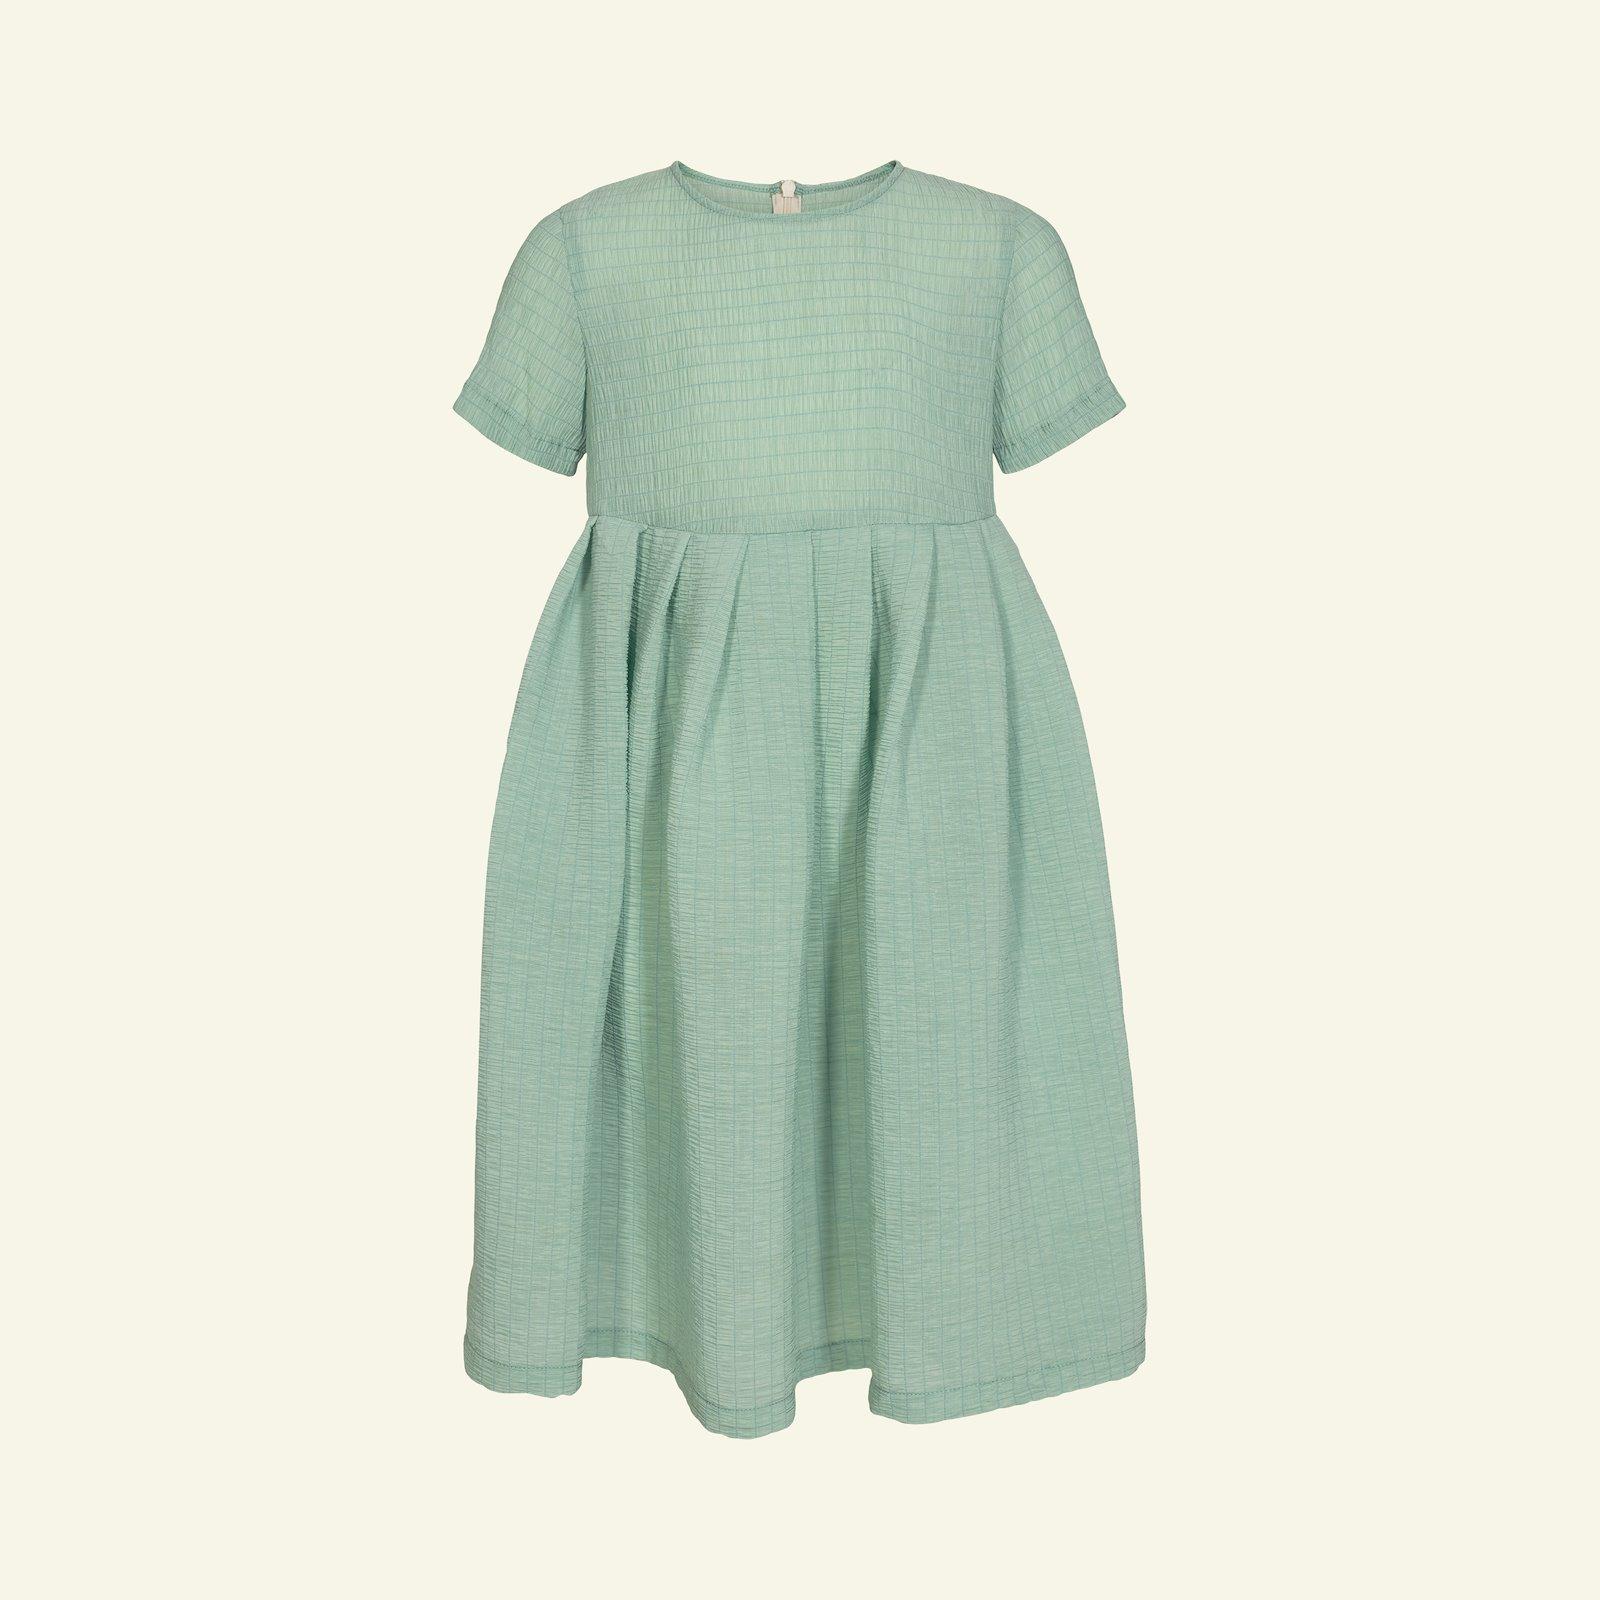 Dress, 98/3y p63059_560261_sskit